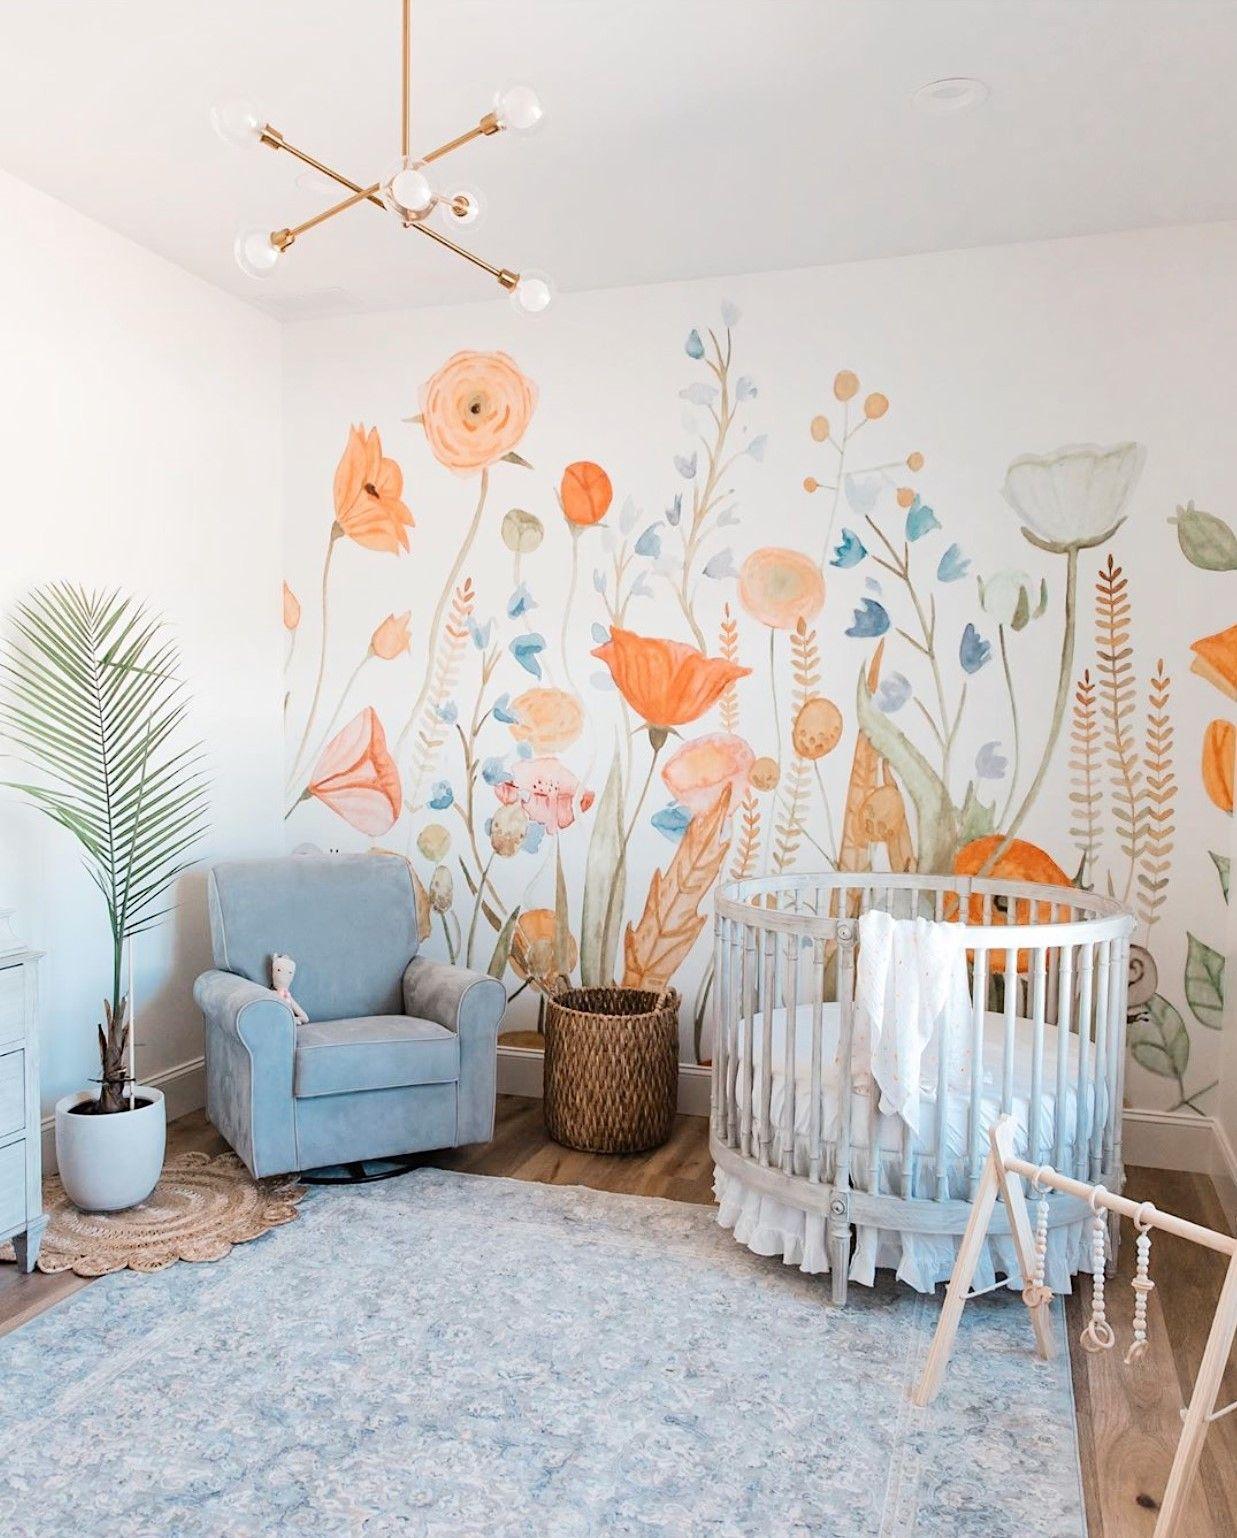 Wildflower Mural | Baby Room Decor, Kids Room Murals, Baby Girl Nursery Room